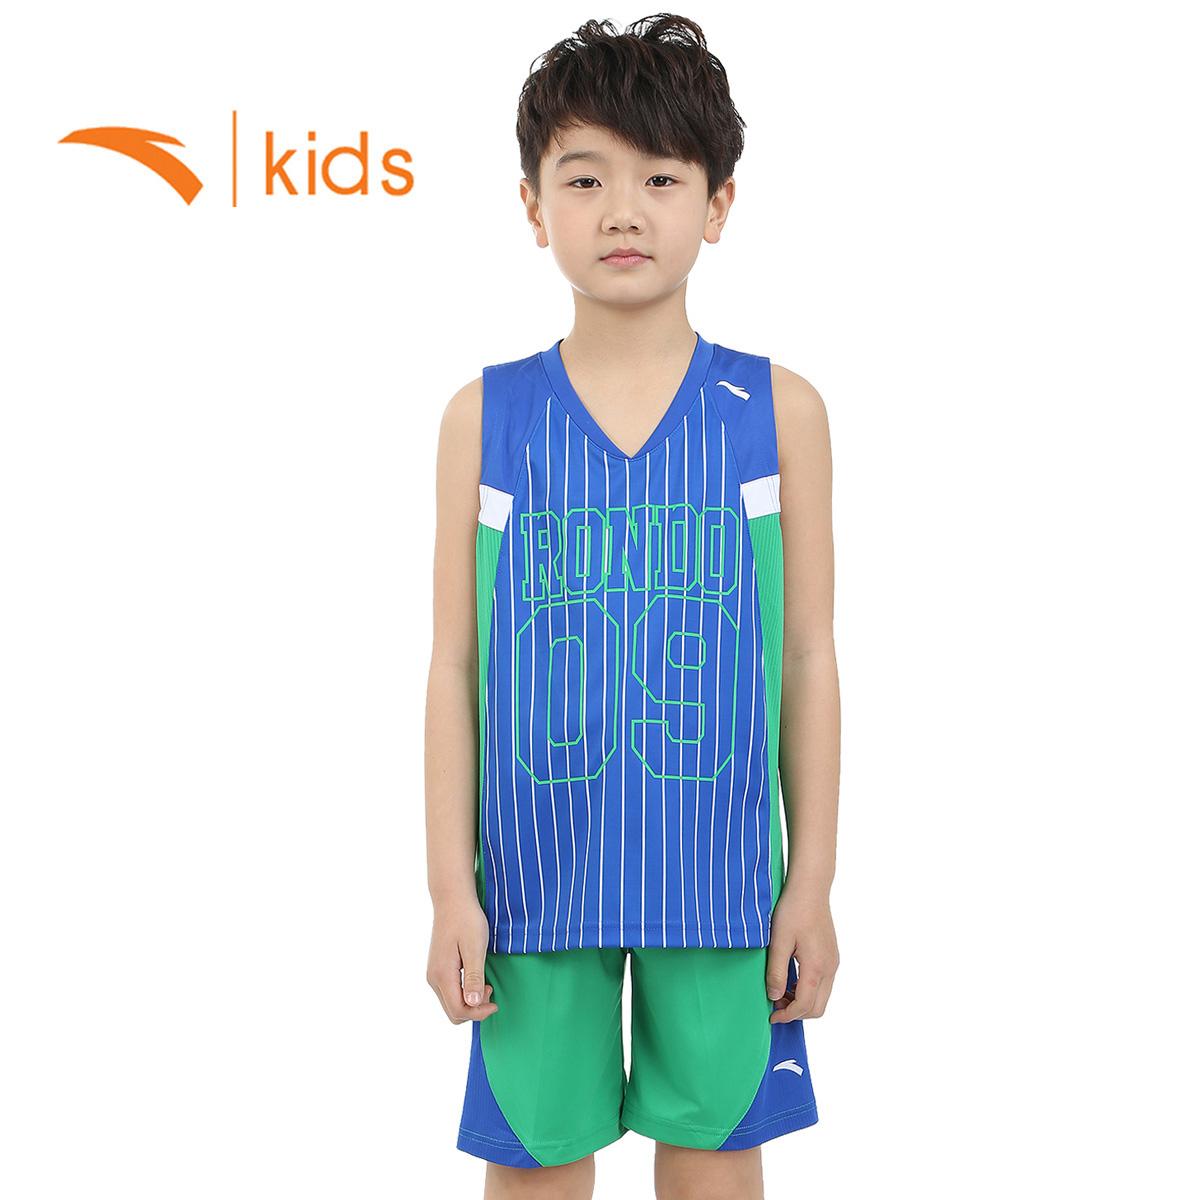 одежда для занятий баскетболом Anta 35521203 2015